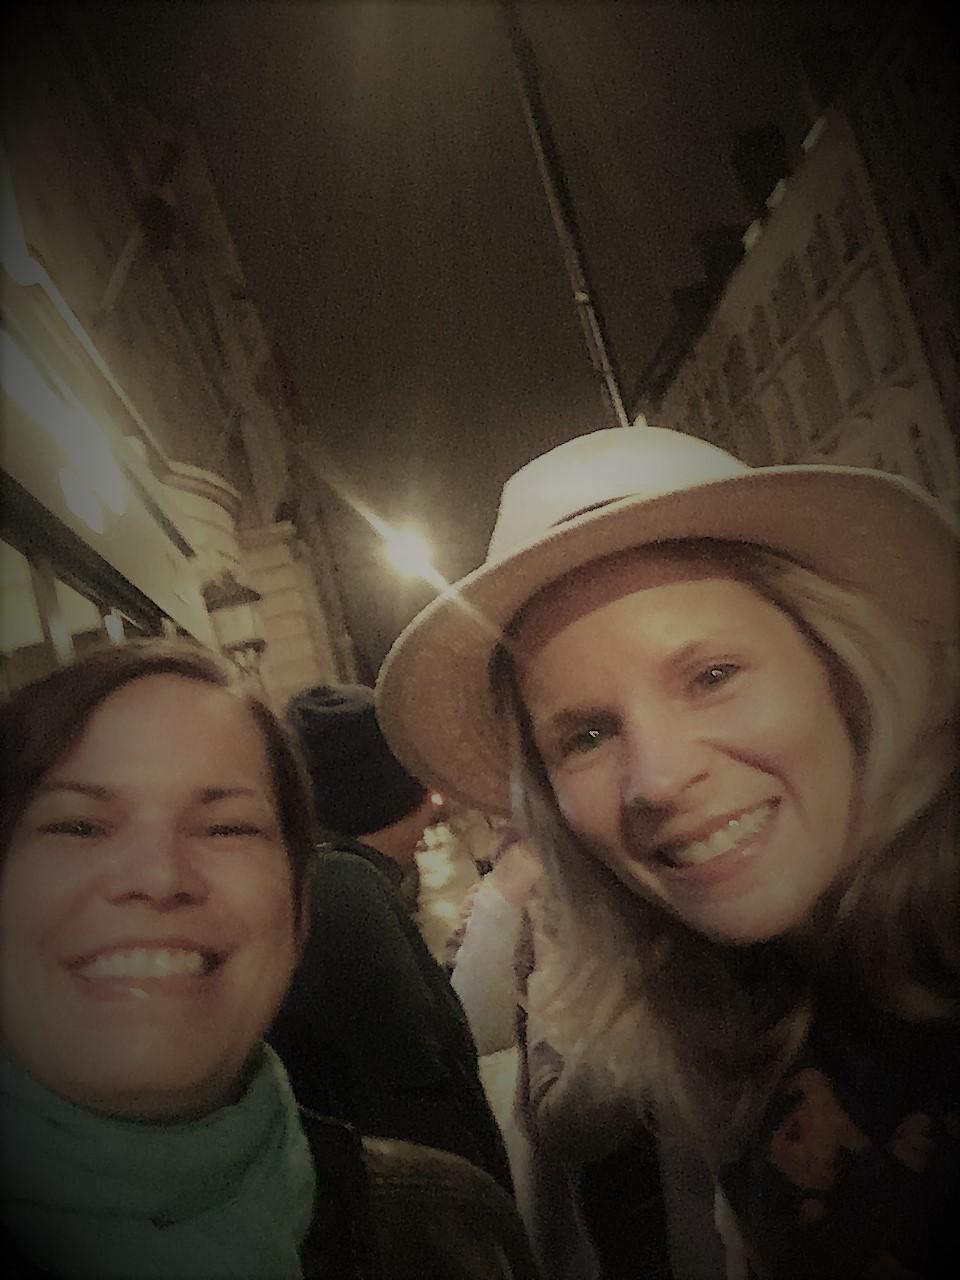 Selfie with Kelli O'Hara - Copy